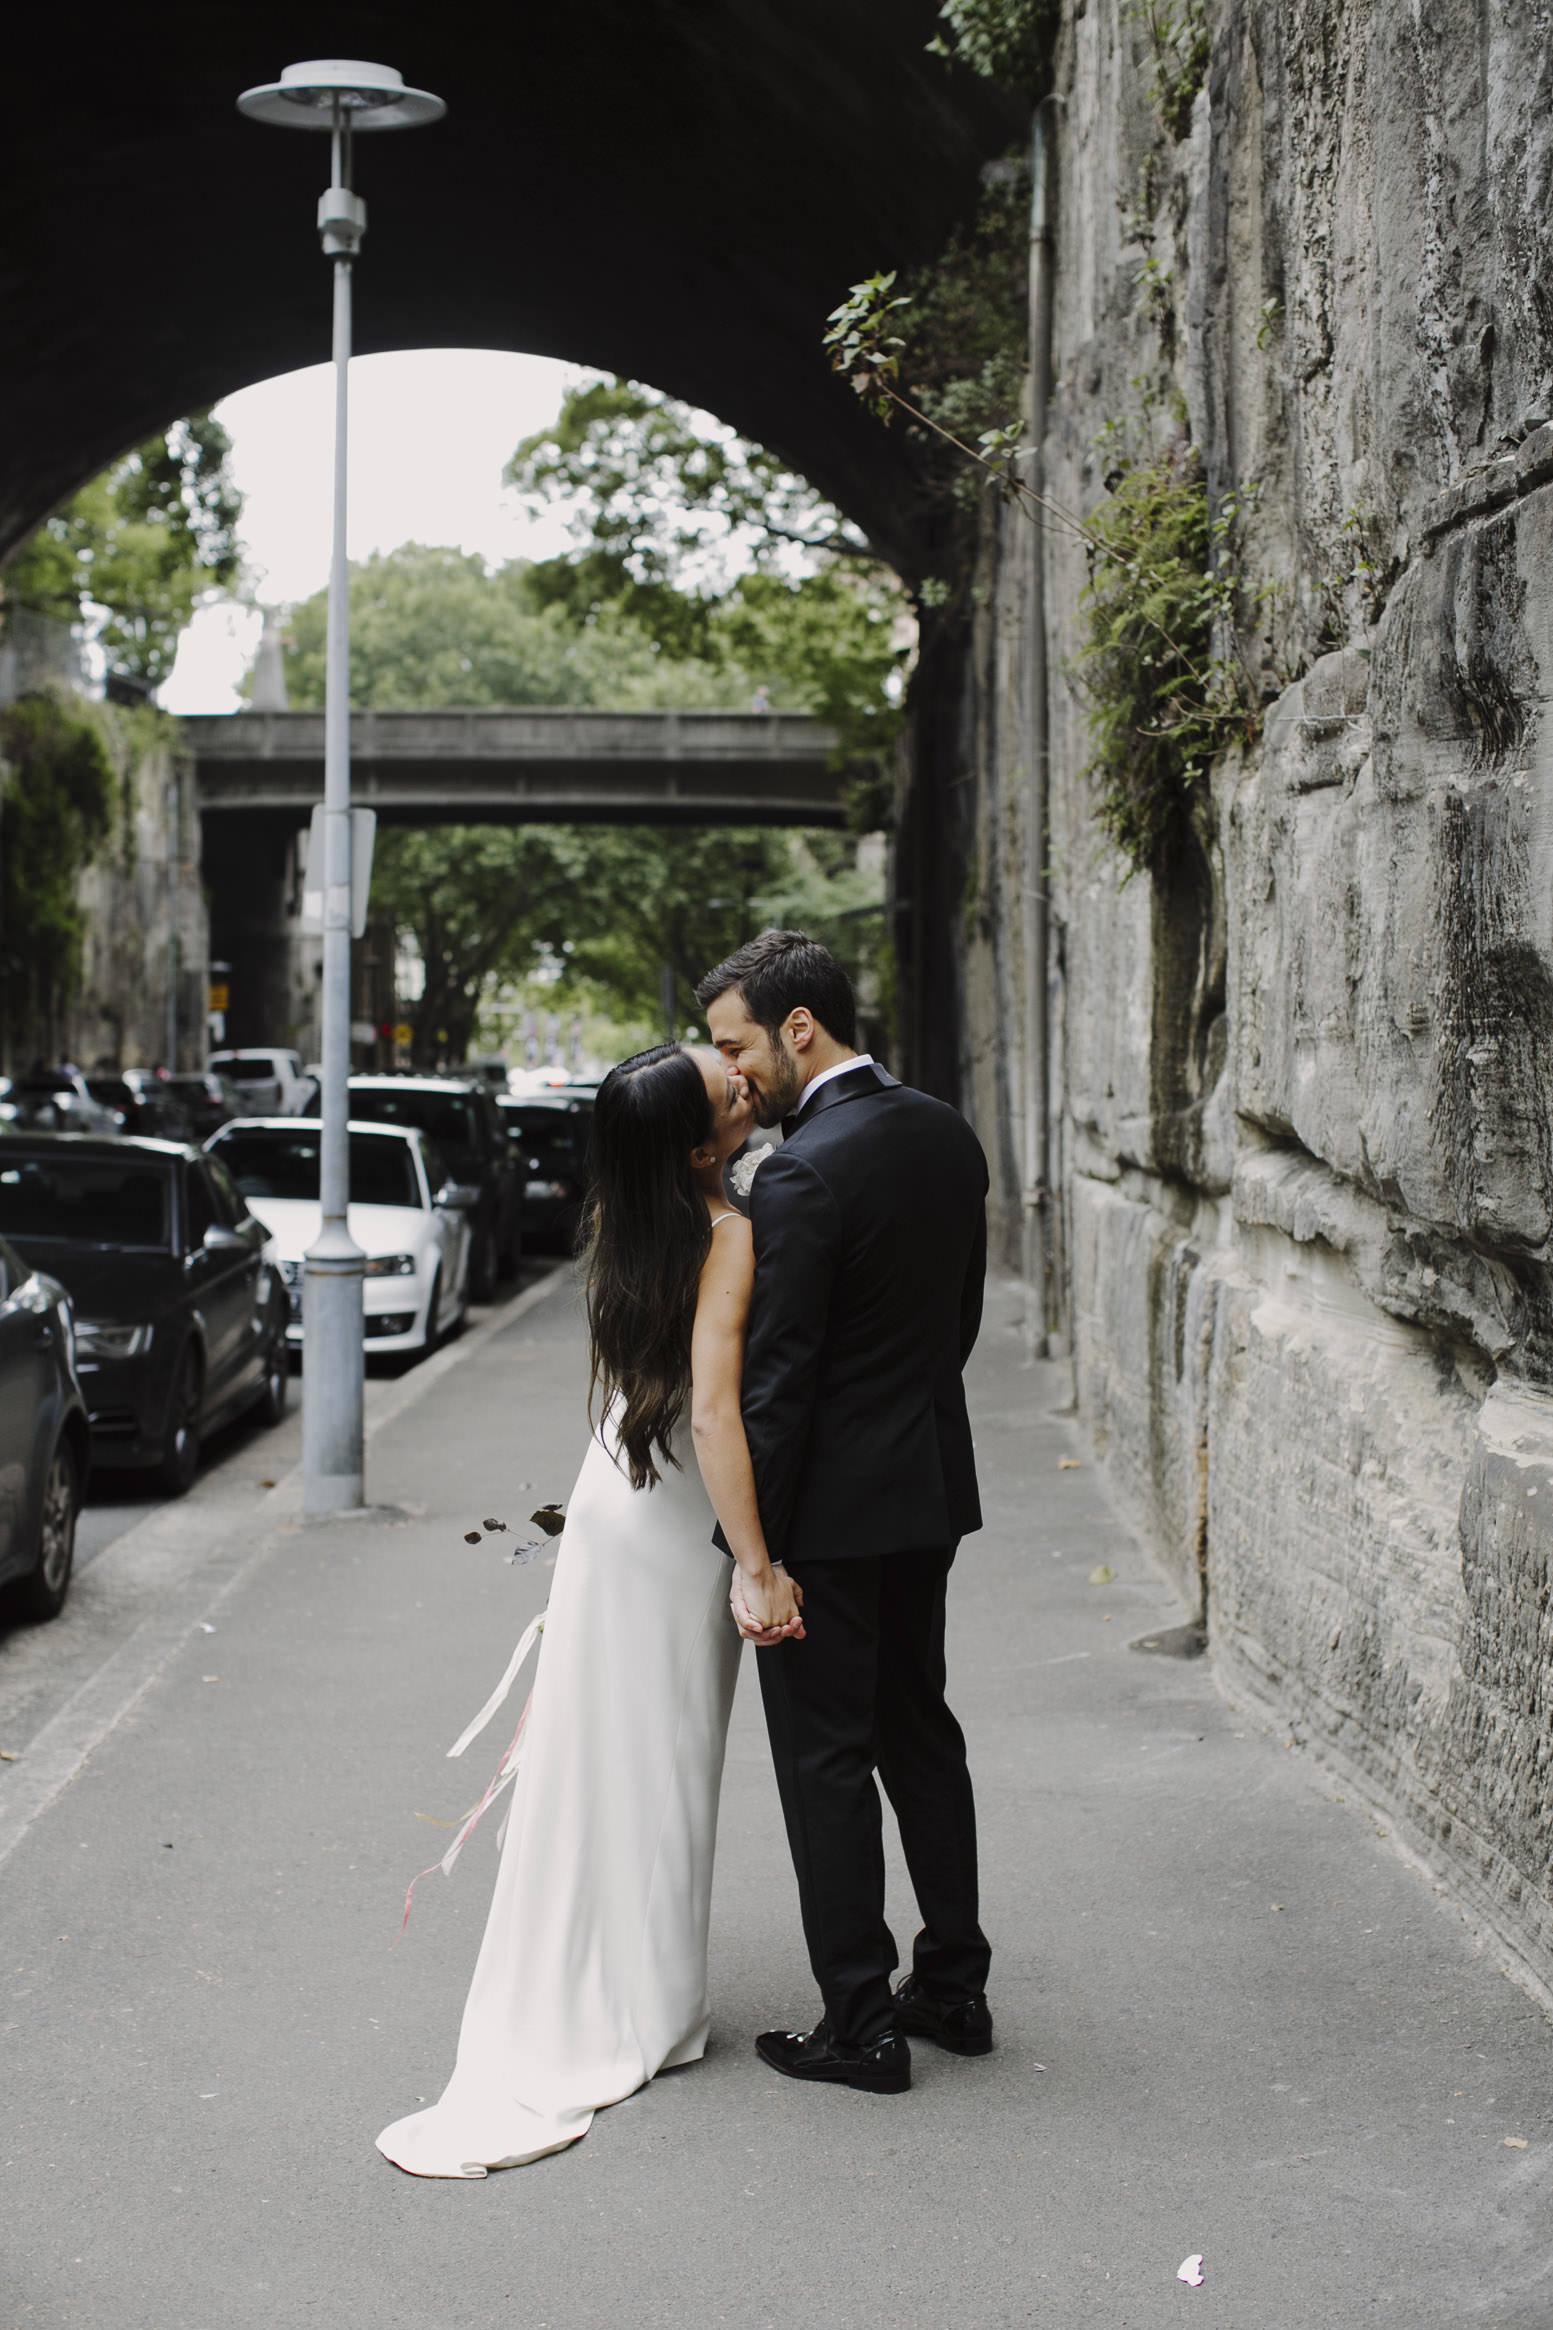 151122_justinaaron_wedding_anja_camilo_pr-125.jpg